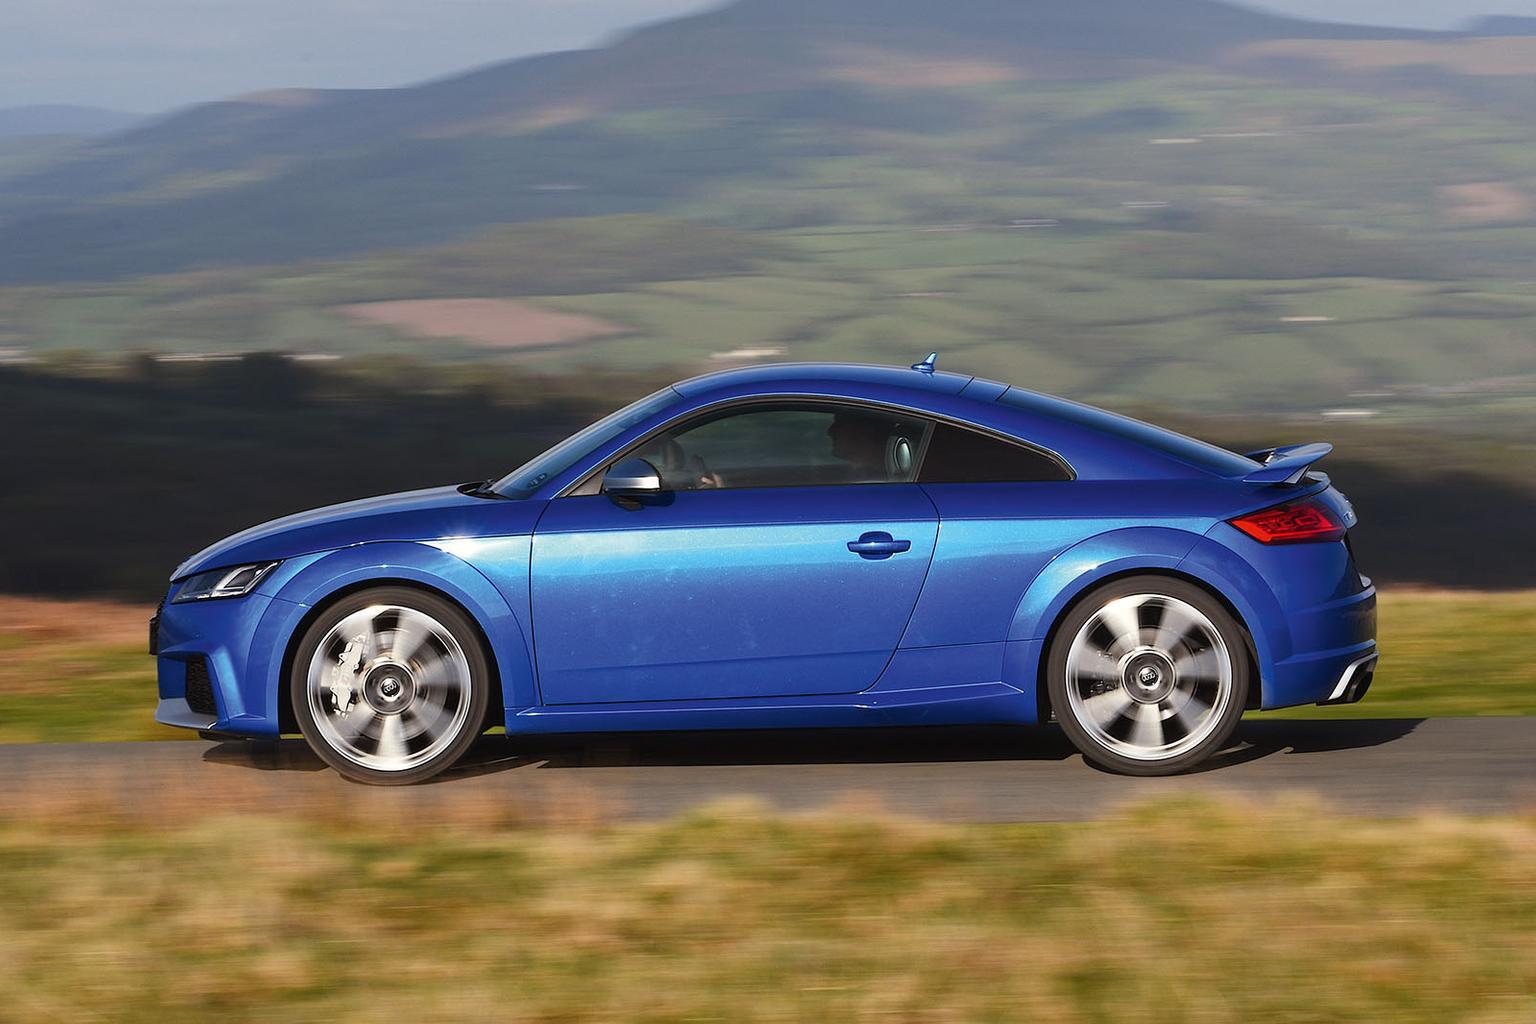 New Alpine A110 vs Audi TT RS vs Porsche Cayman